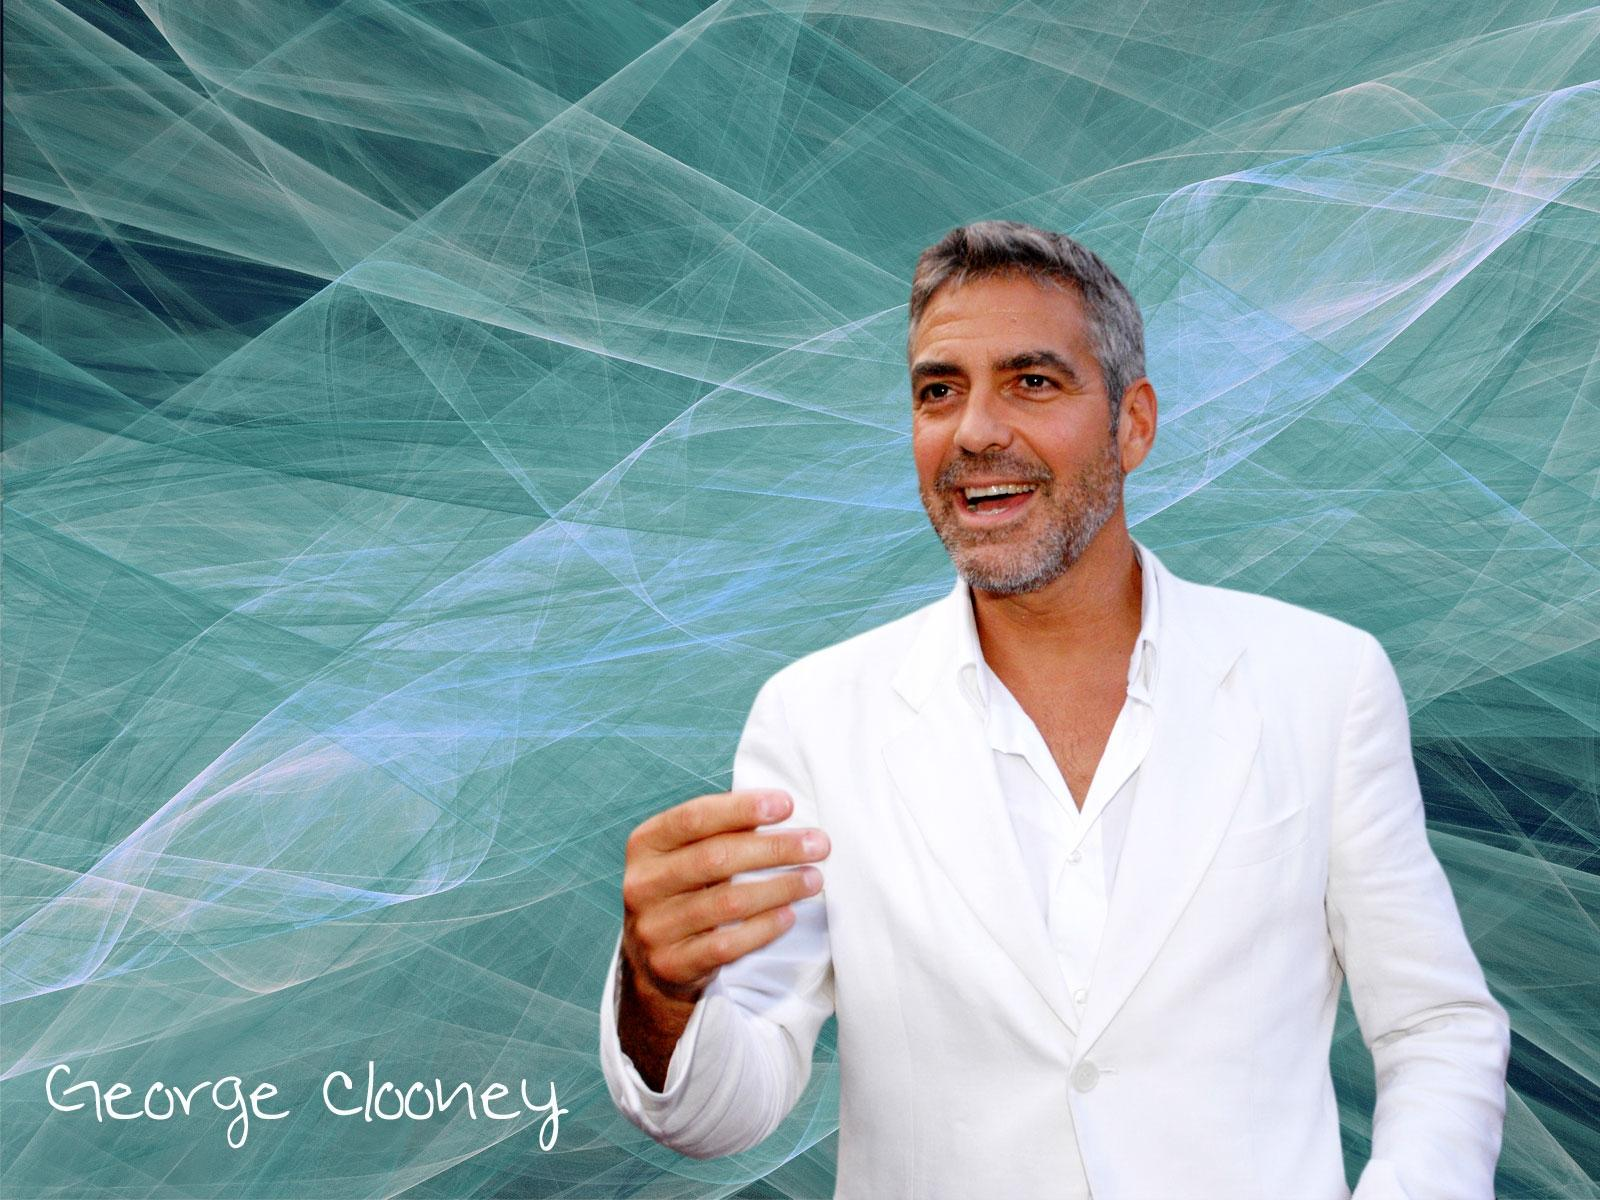 Image George Clooney Celebrities 1600x1200